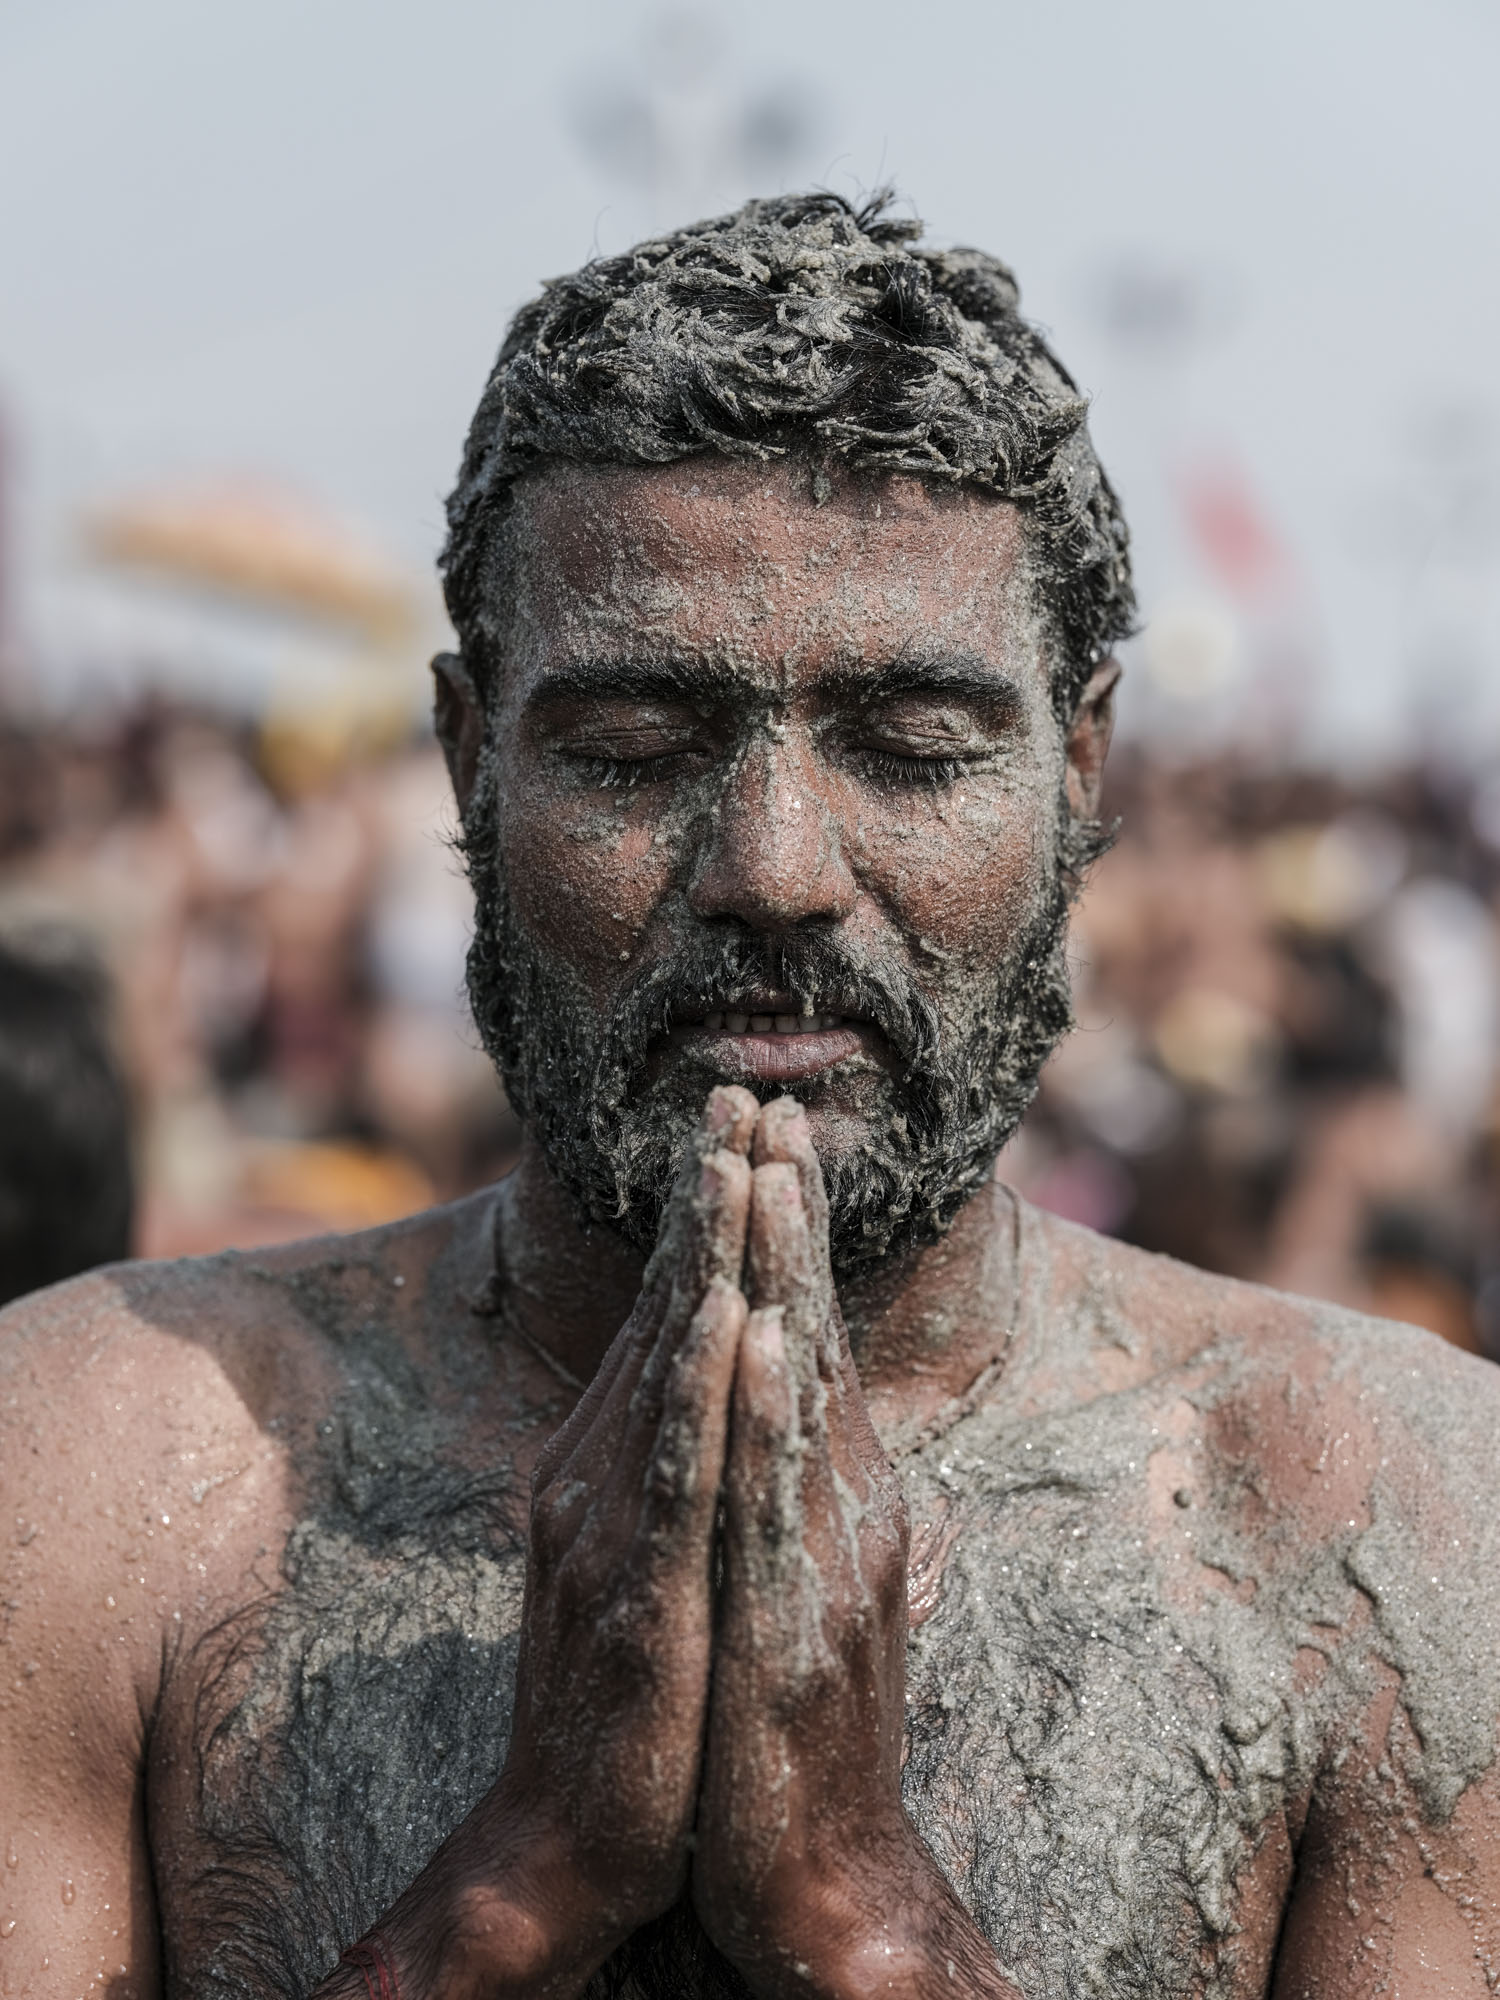 4 february man prayer pilgrims Kumbh mela 2019 India Allahabad Prayagraj Ardh hindu religious Festival event rivers photographer jose jeuland photography